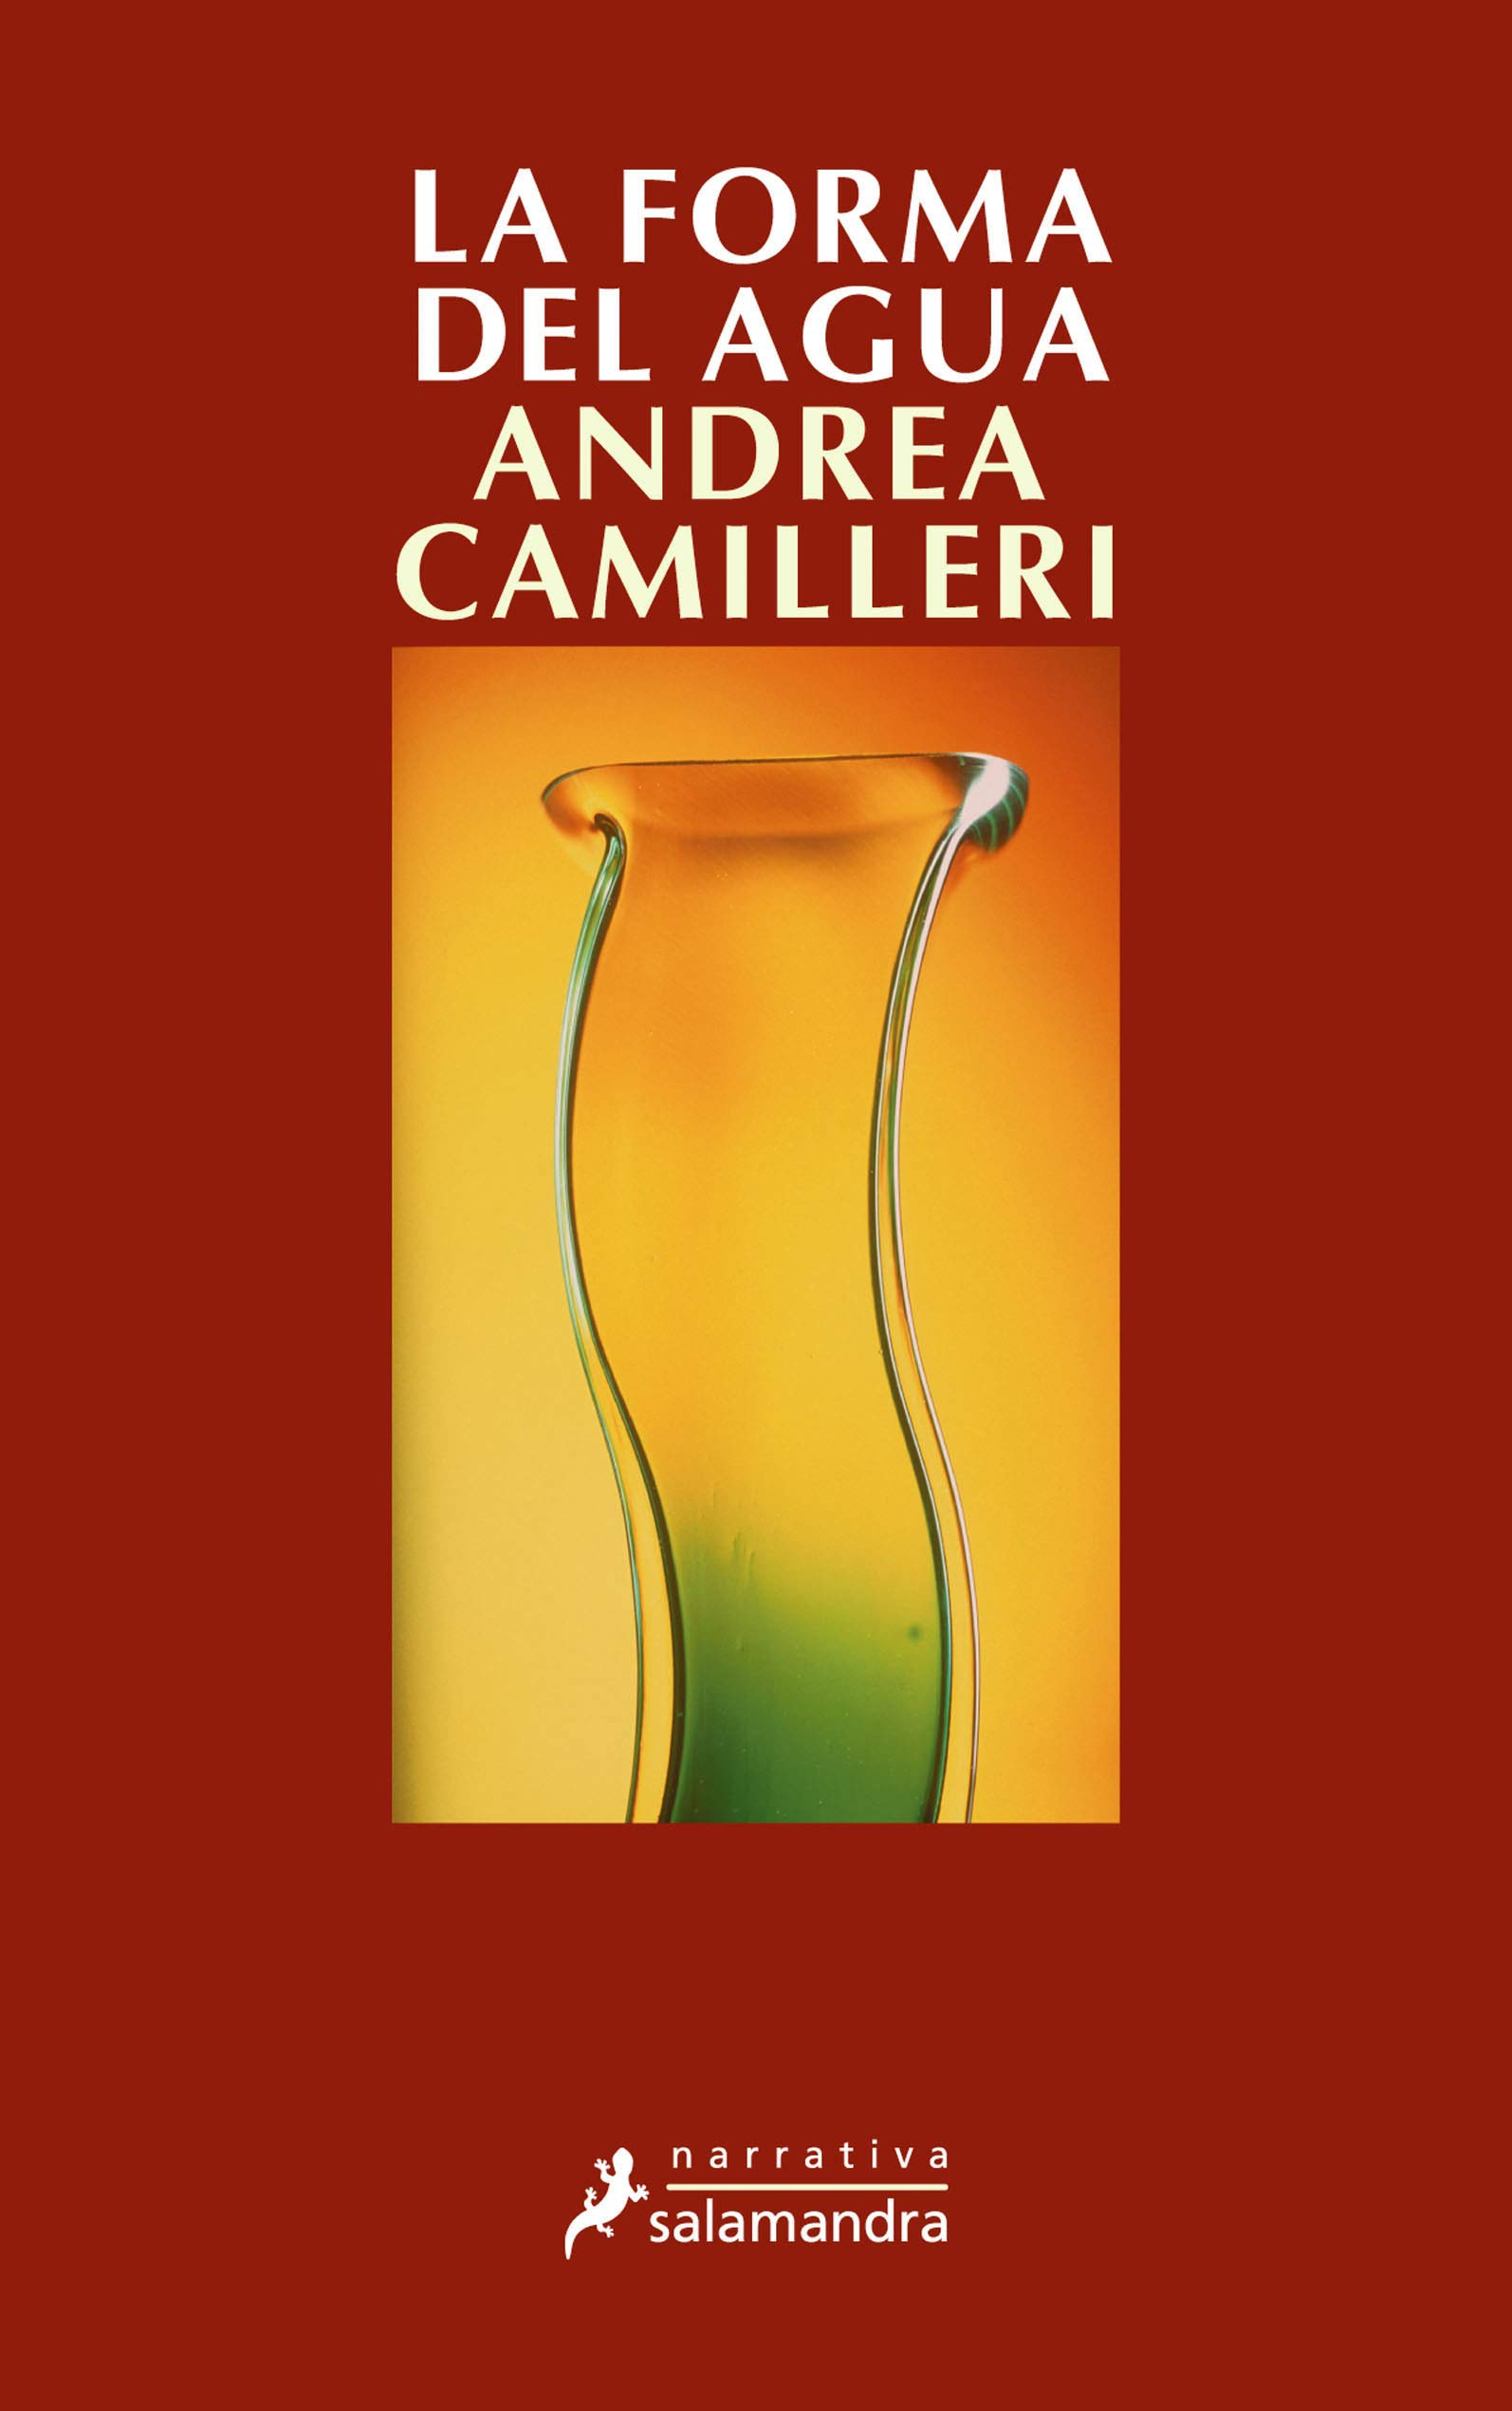 La forma del agua: Montalbano - Libro 1 (Narrativa): Amazon.es: Andrea  Camilleri: Libros